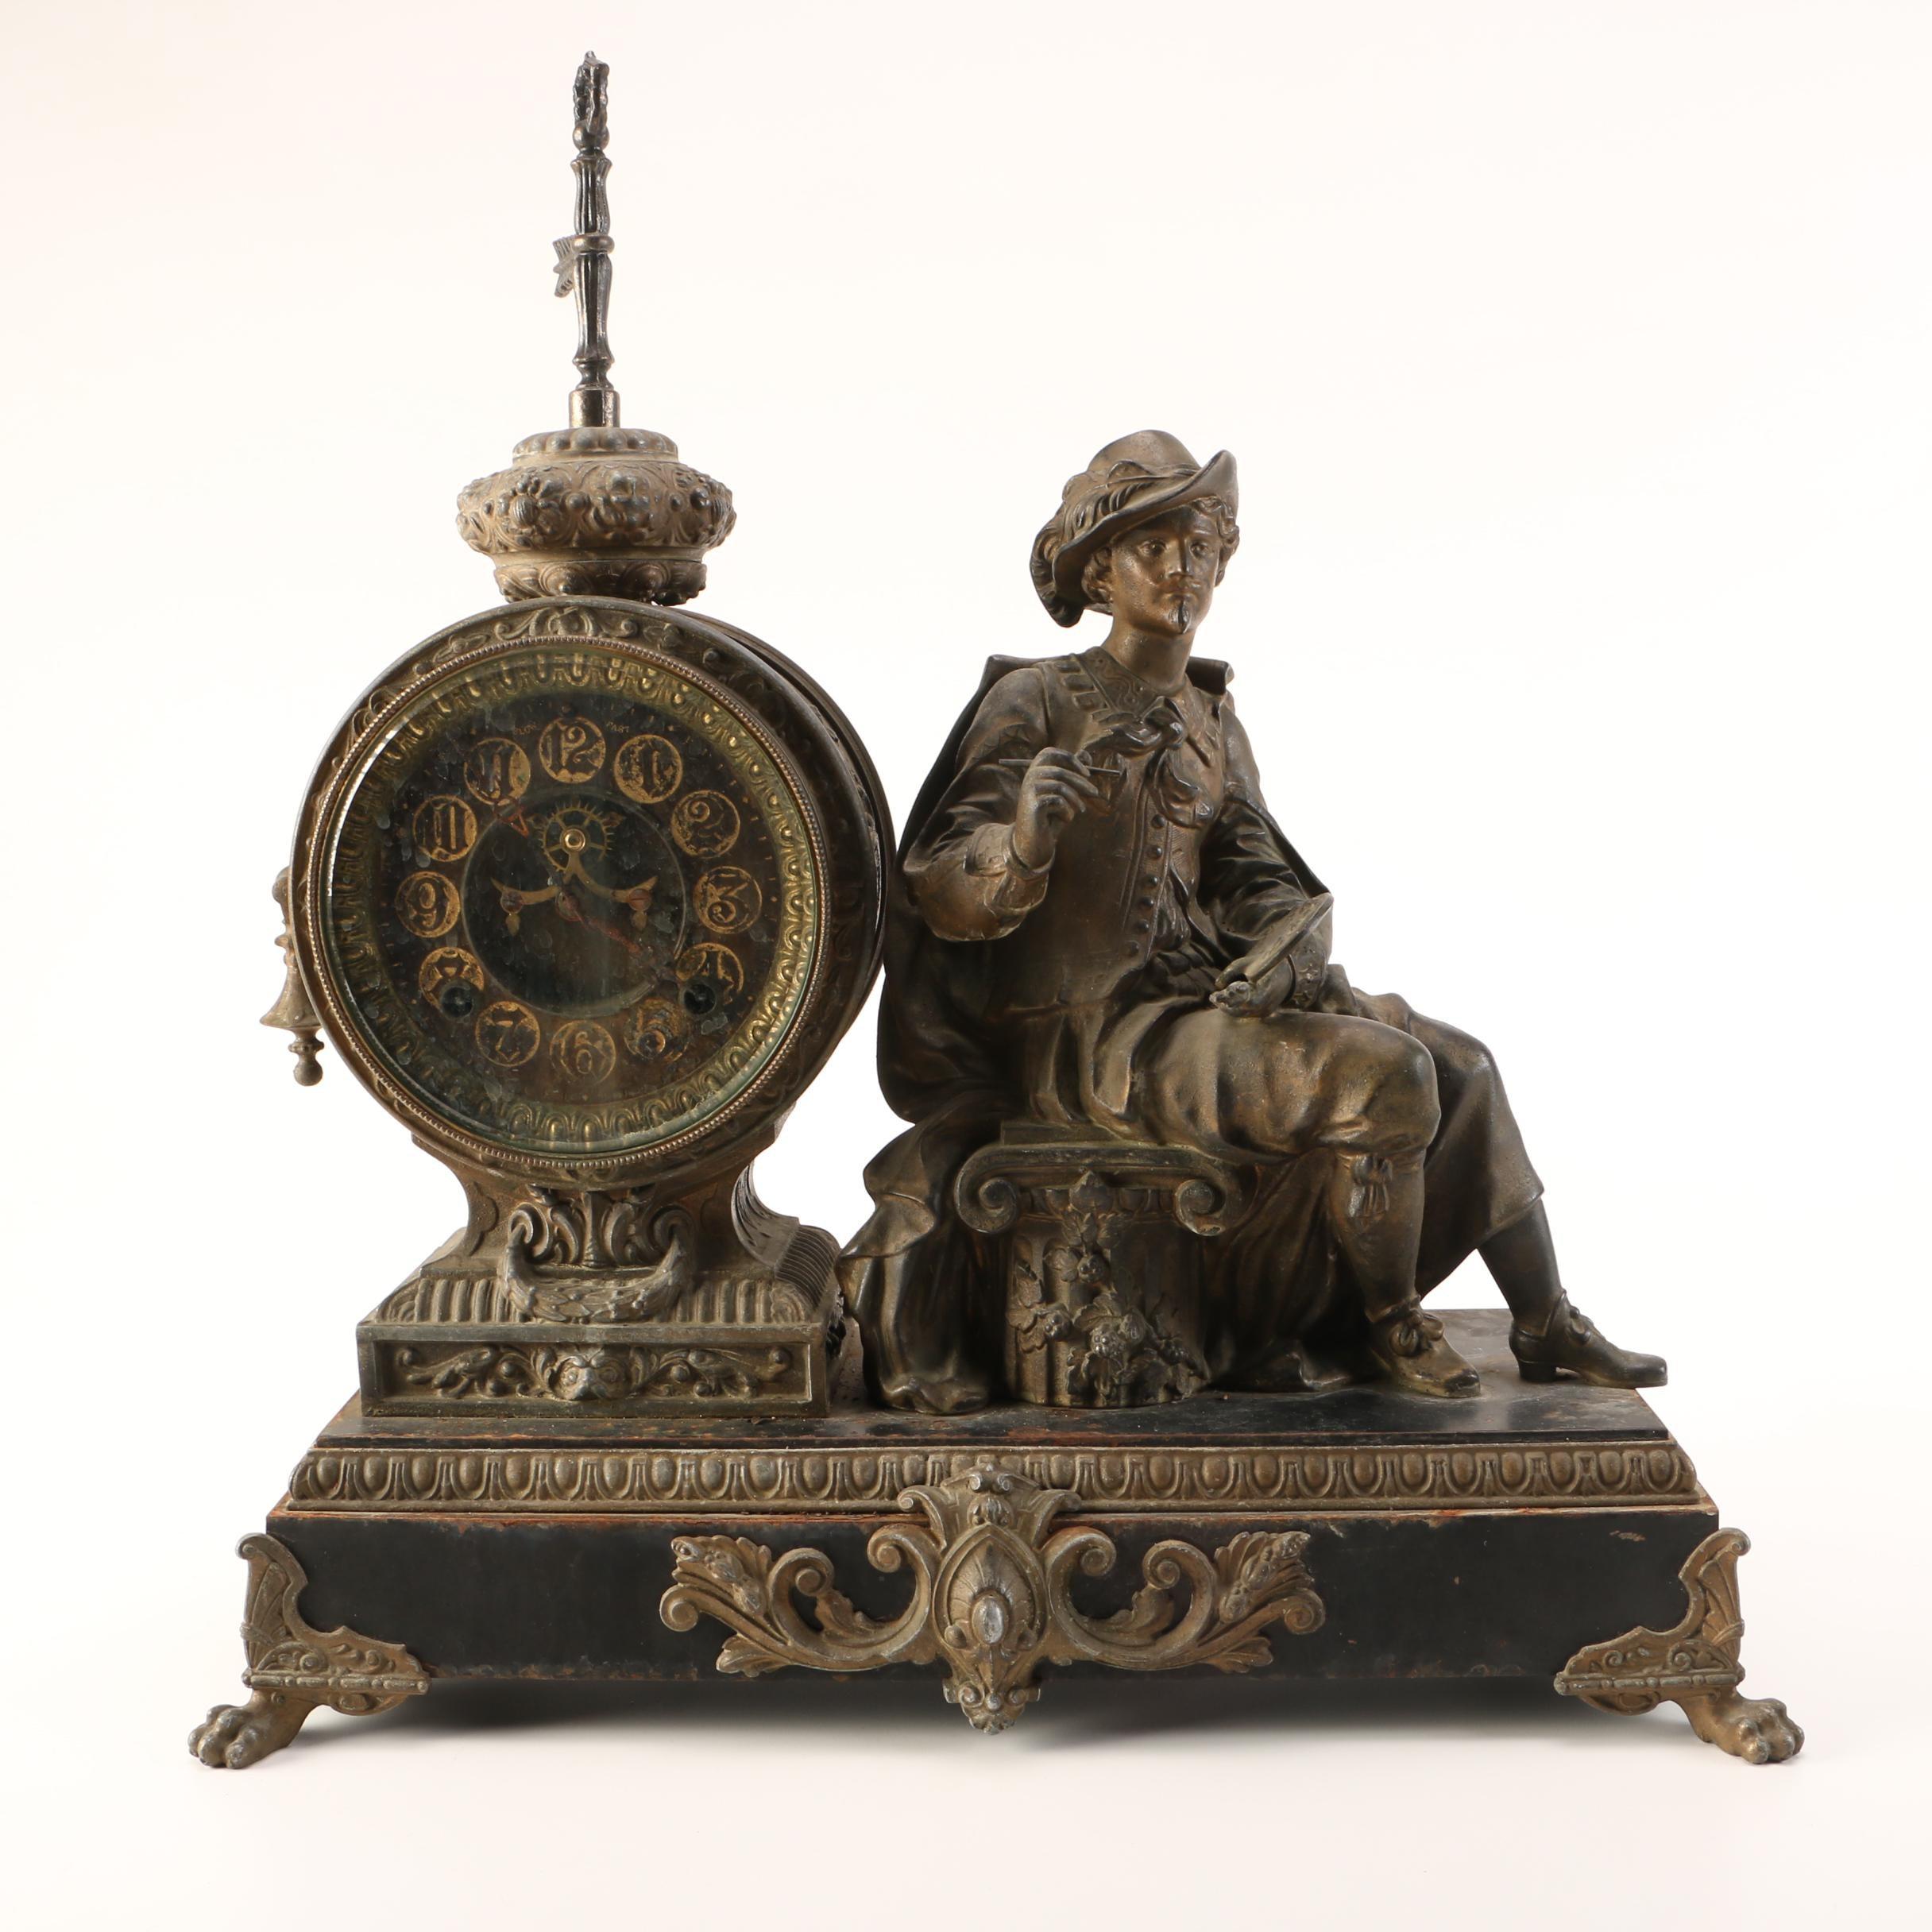 Analog Desk Clock with Figurine